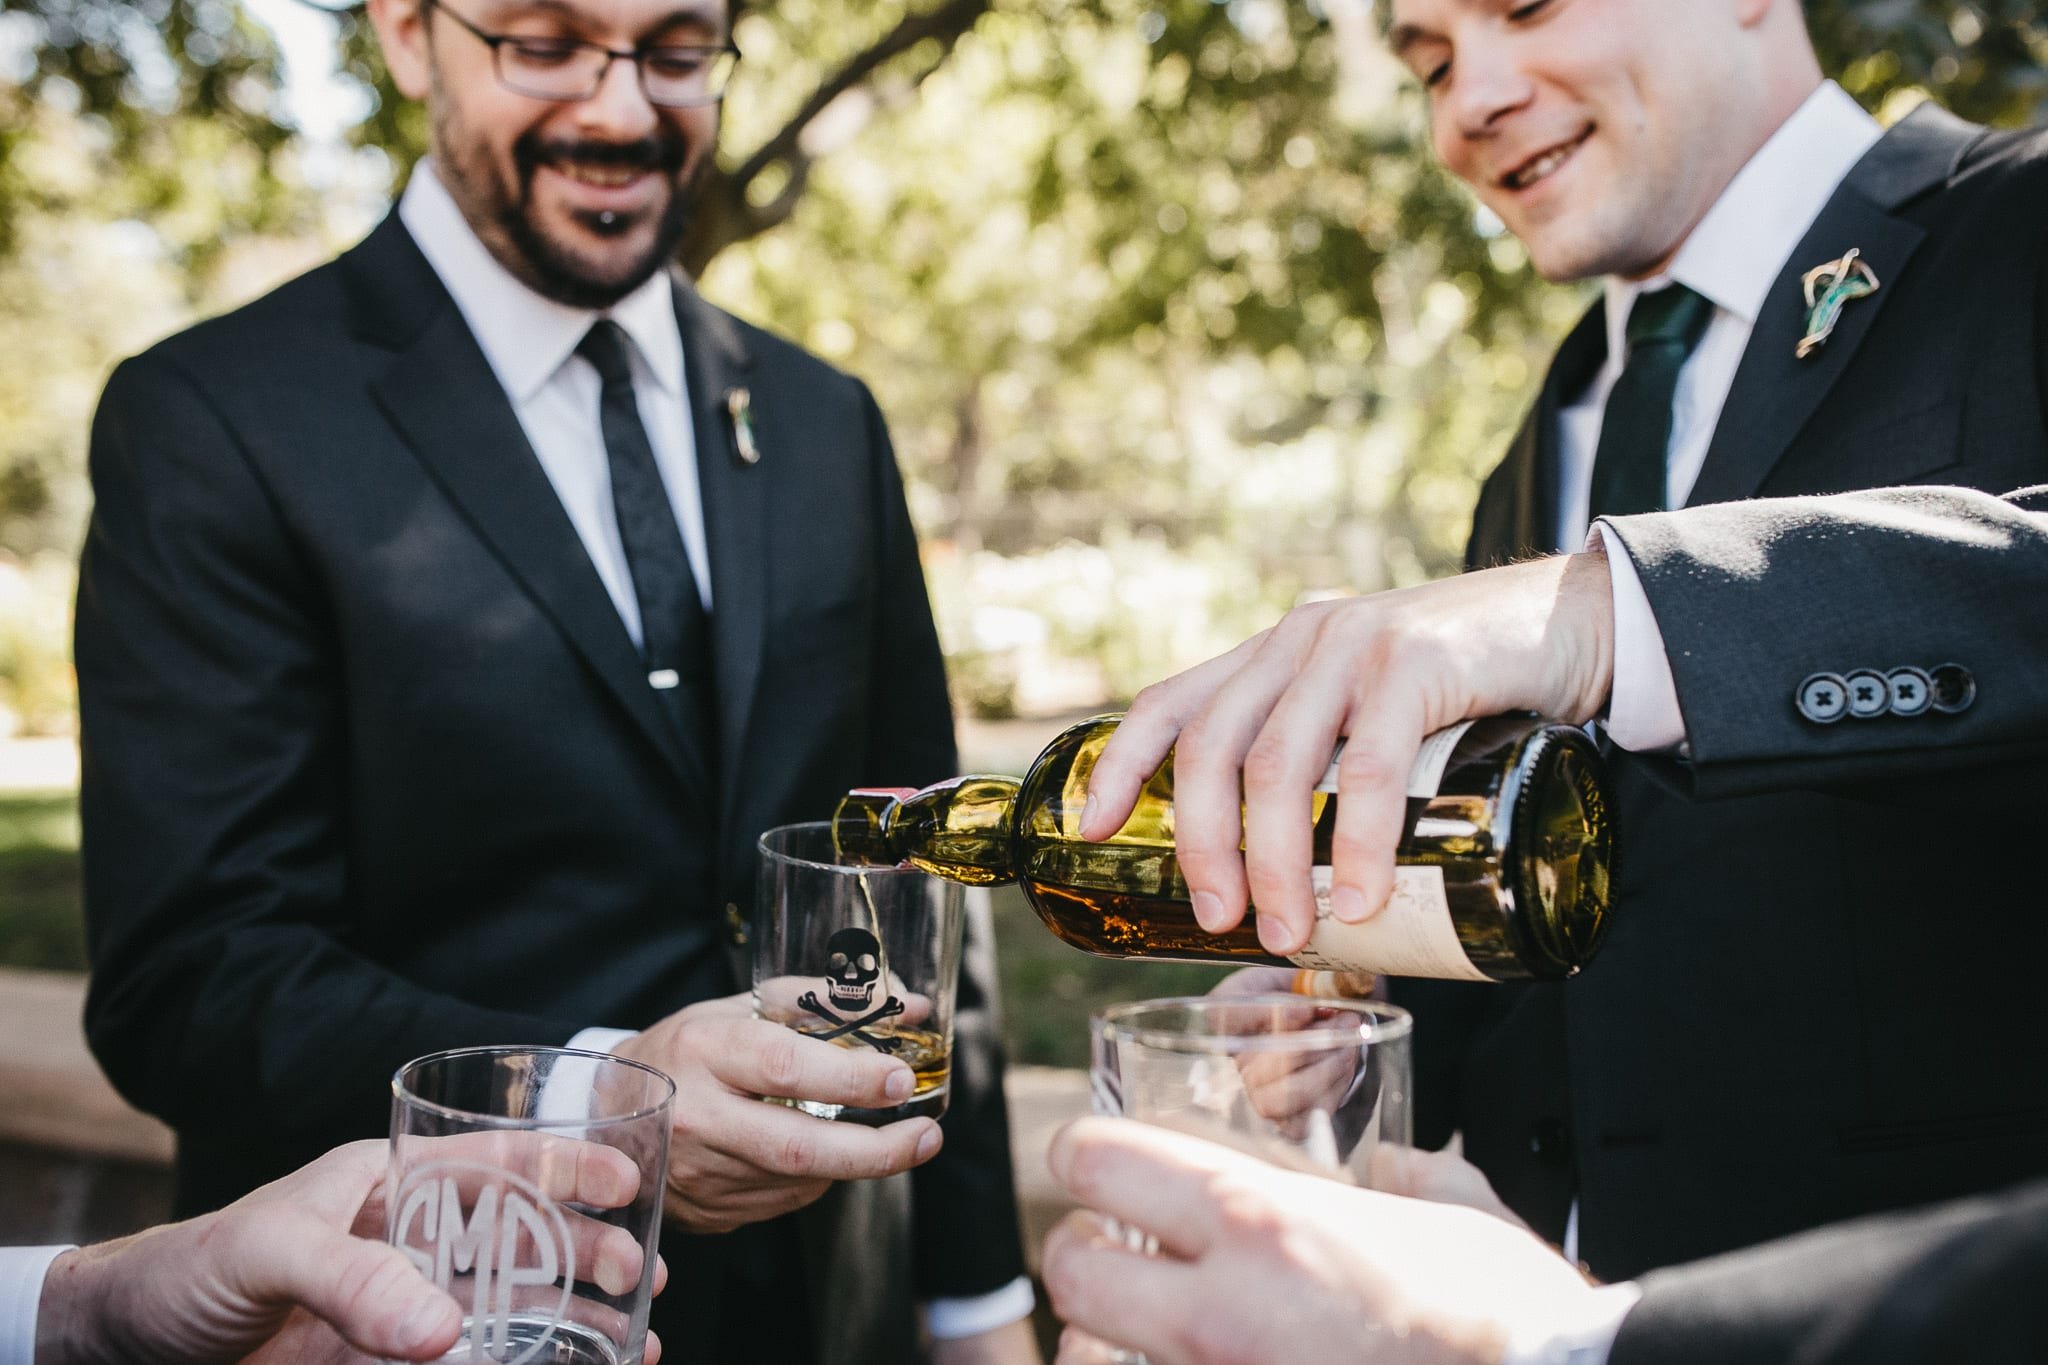 chico-card-center-wedding-photographer-18